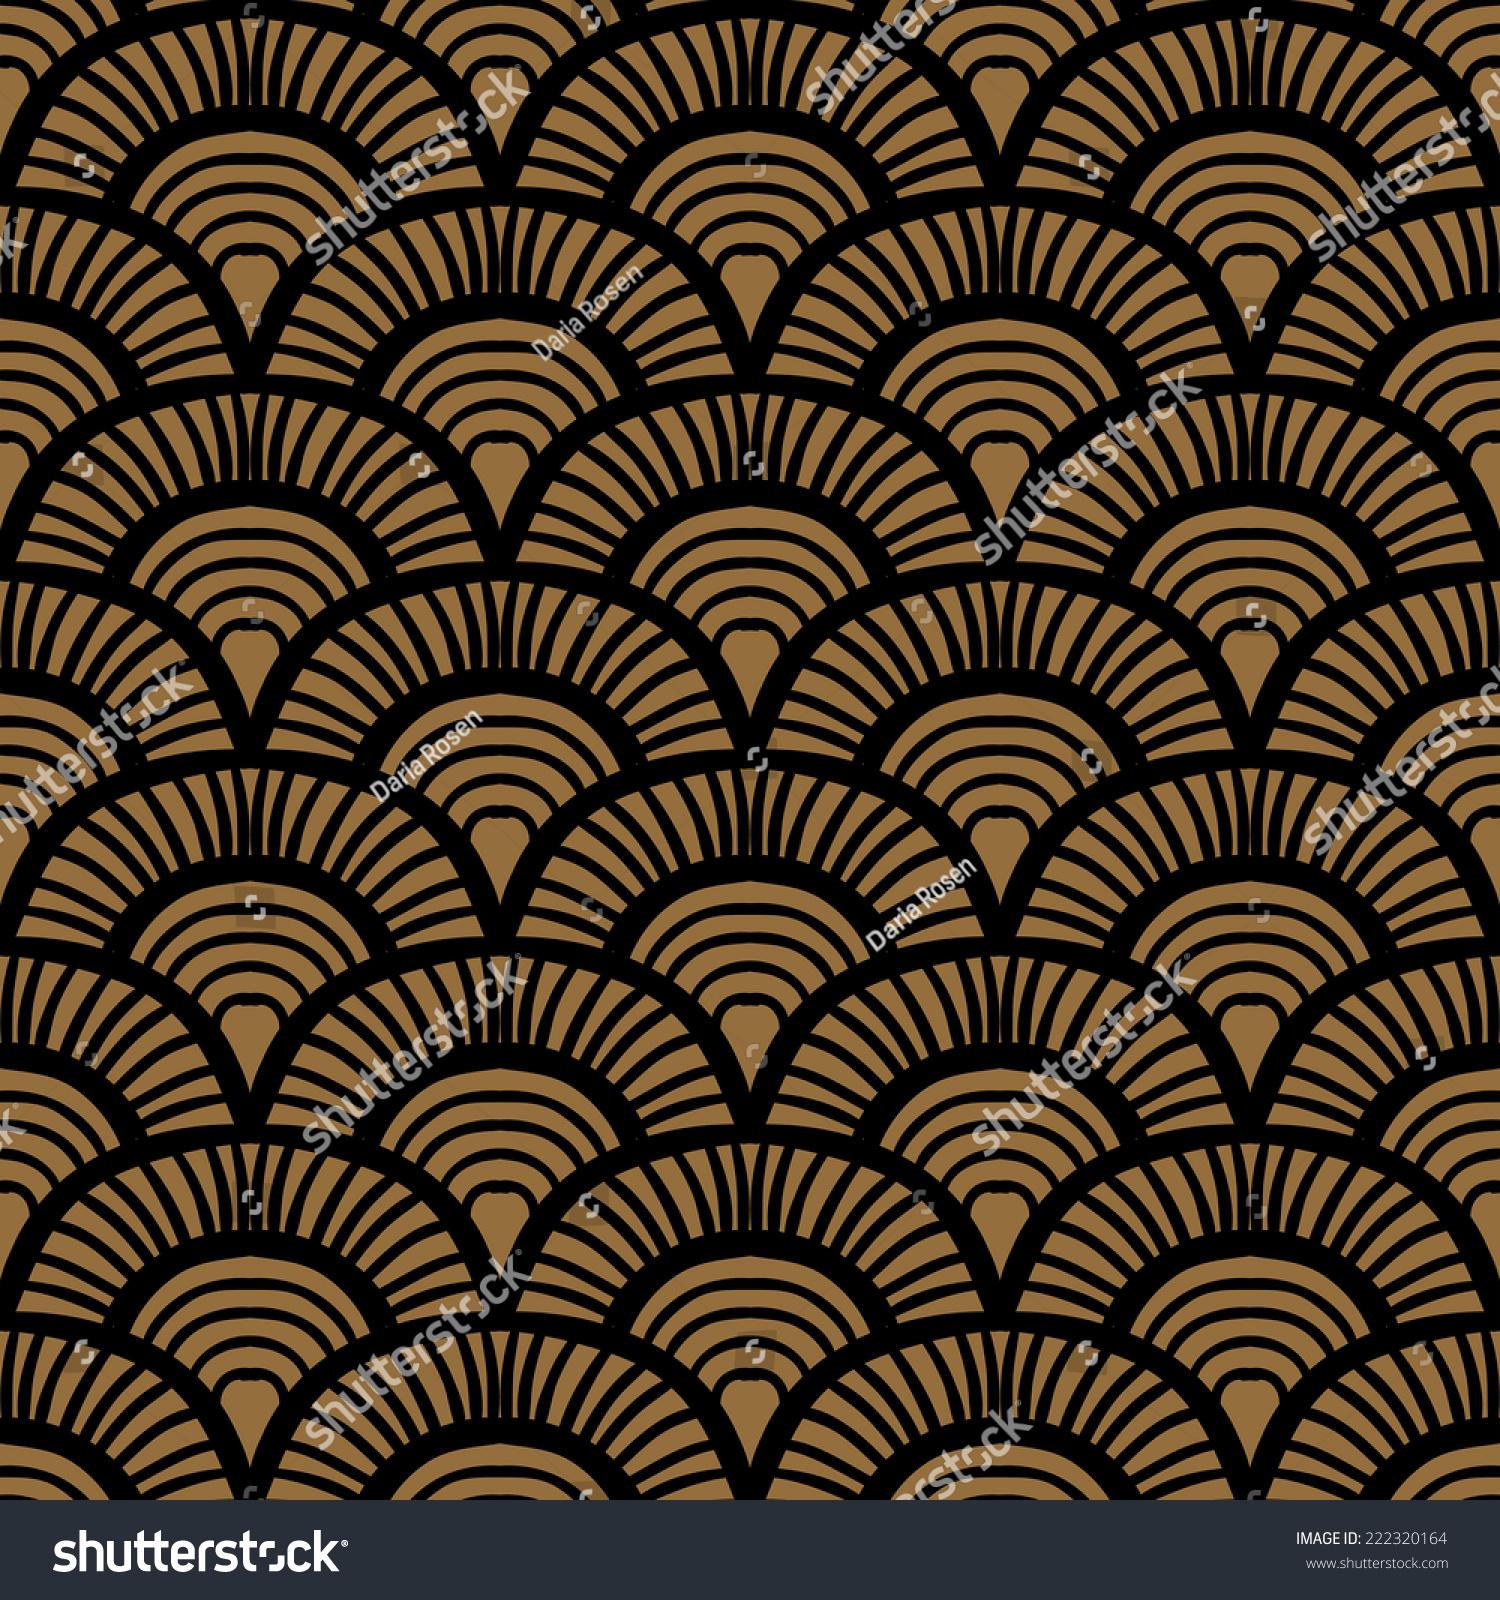 vintage hand drawn art deco pattern stock vector 222320164 shutterstock. Black Bedroom Furniture Sets. Home Design Ideas